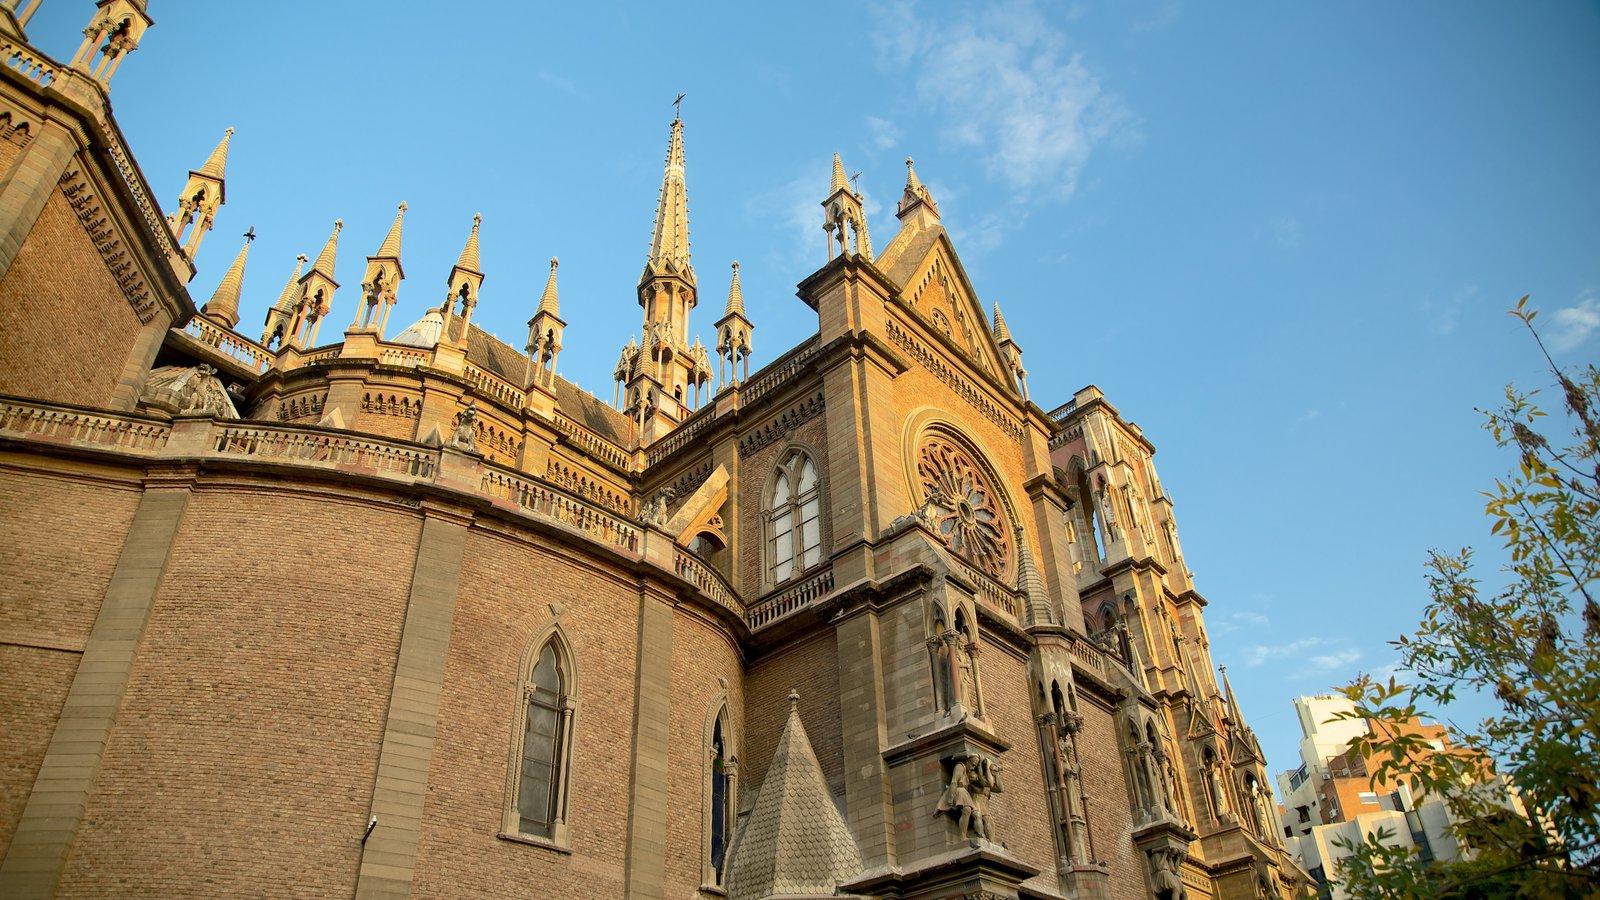 Iglesia del Sagrado Corazón caracterizando arquitetura de patrimônio, elementos religiosos e um pôr do sol